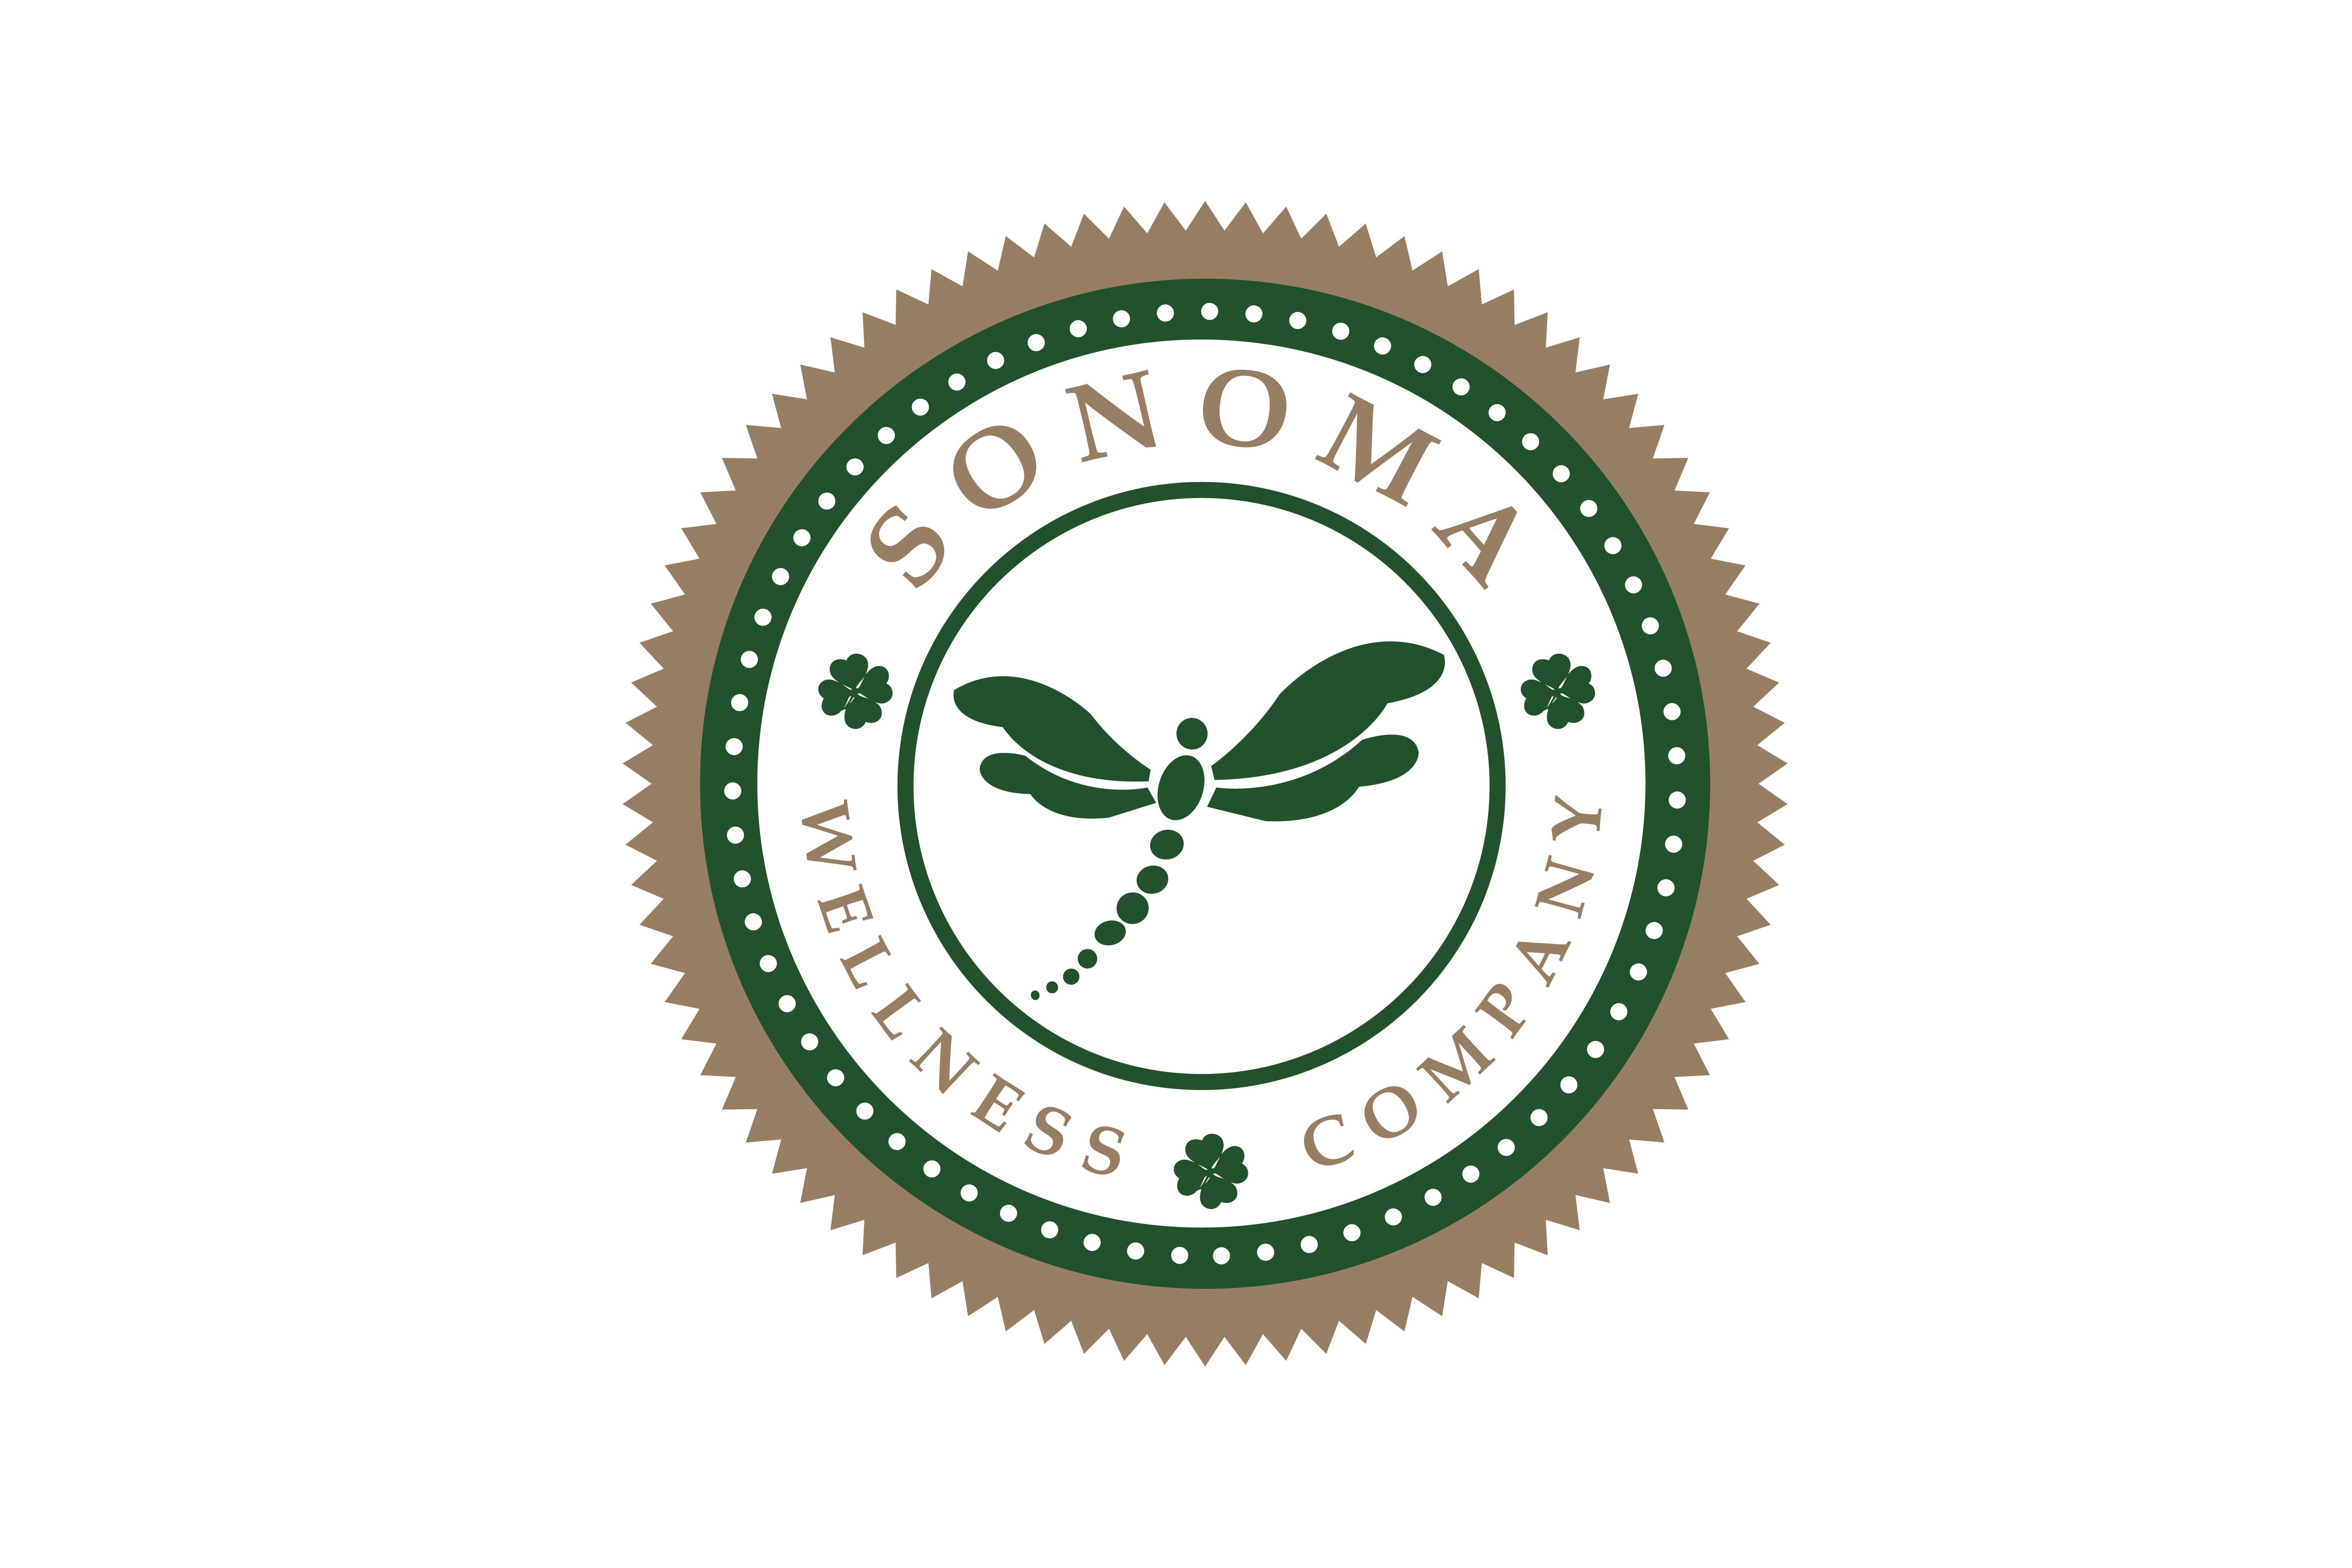 Sonoma Wellness Company